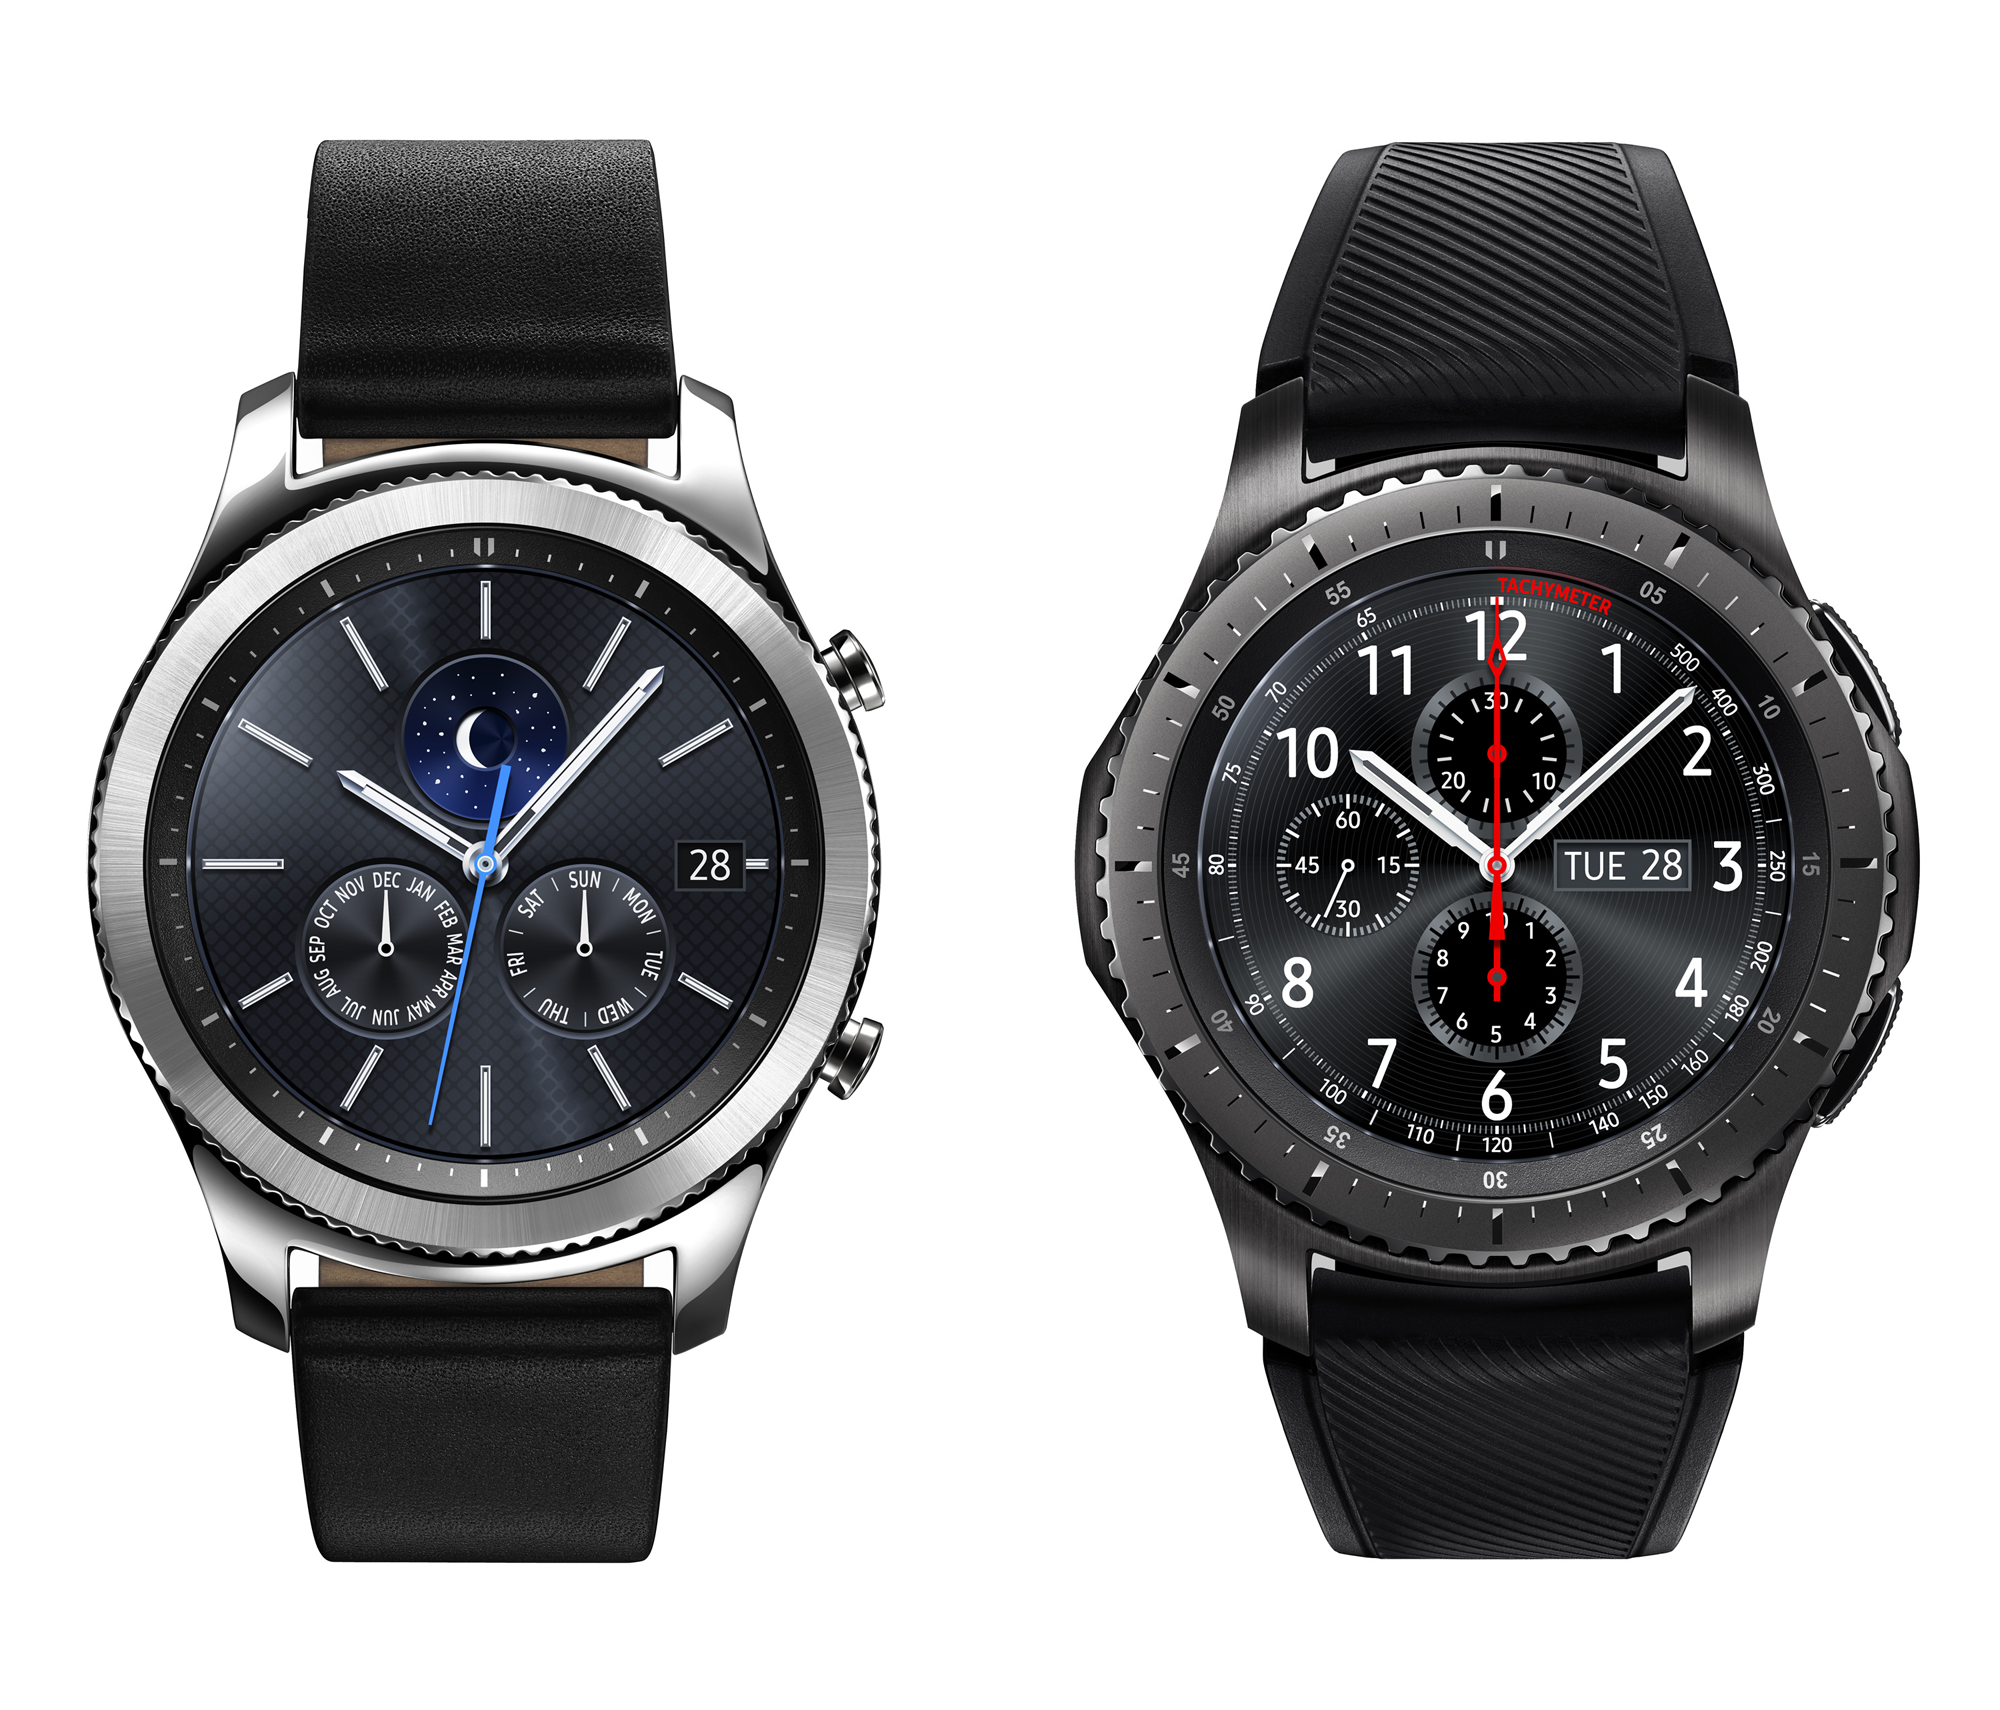 Samsung Gear S3 Specs Frontier Vs Classic Http Authoritywearables Com Samsung Gear S3 Specs Frontier Vs Classic Smart Watch Samsung Smart Watch Samsung